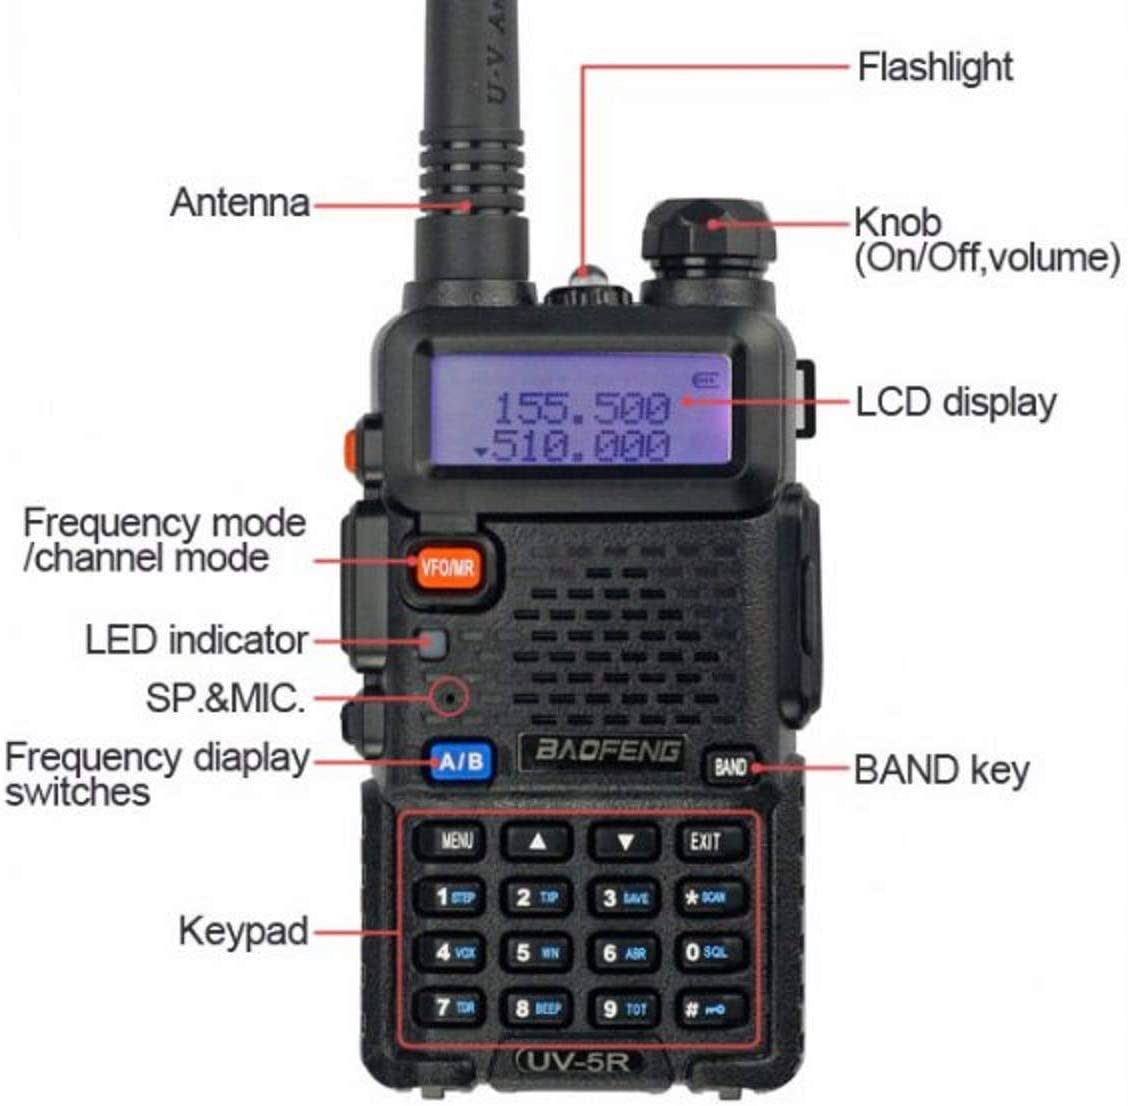 2PCS Baofeng UV-9R Walkie Talkie Interphone Transceiver Ham Radio Dual band 5W